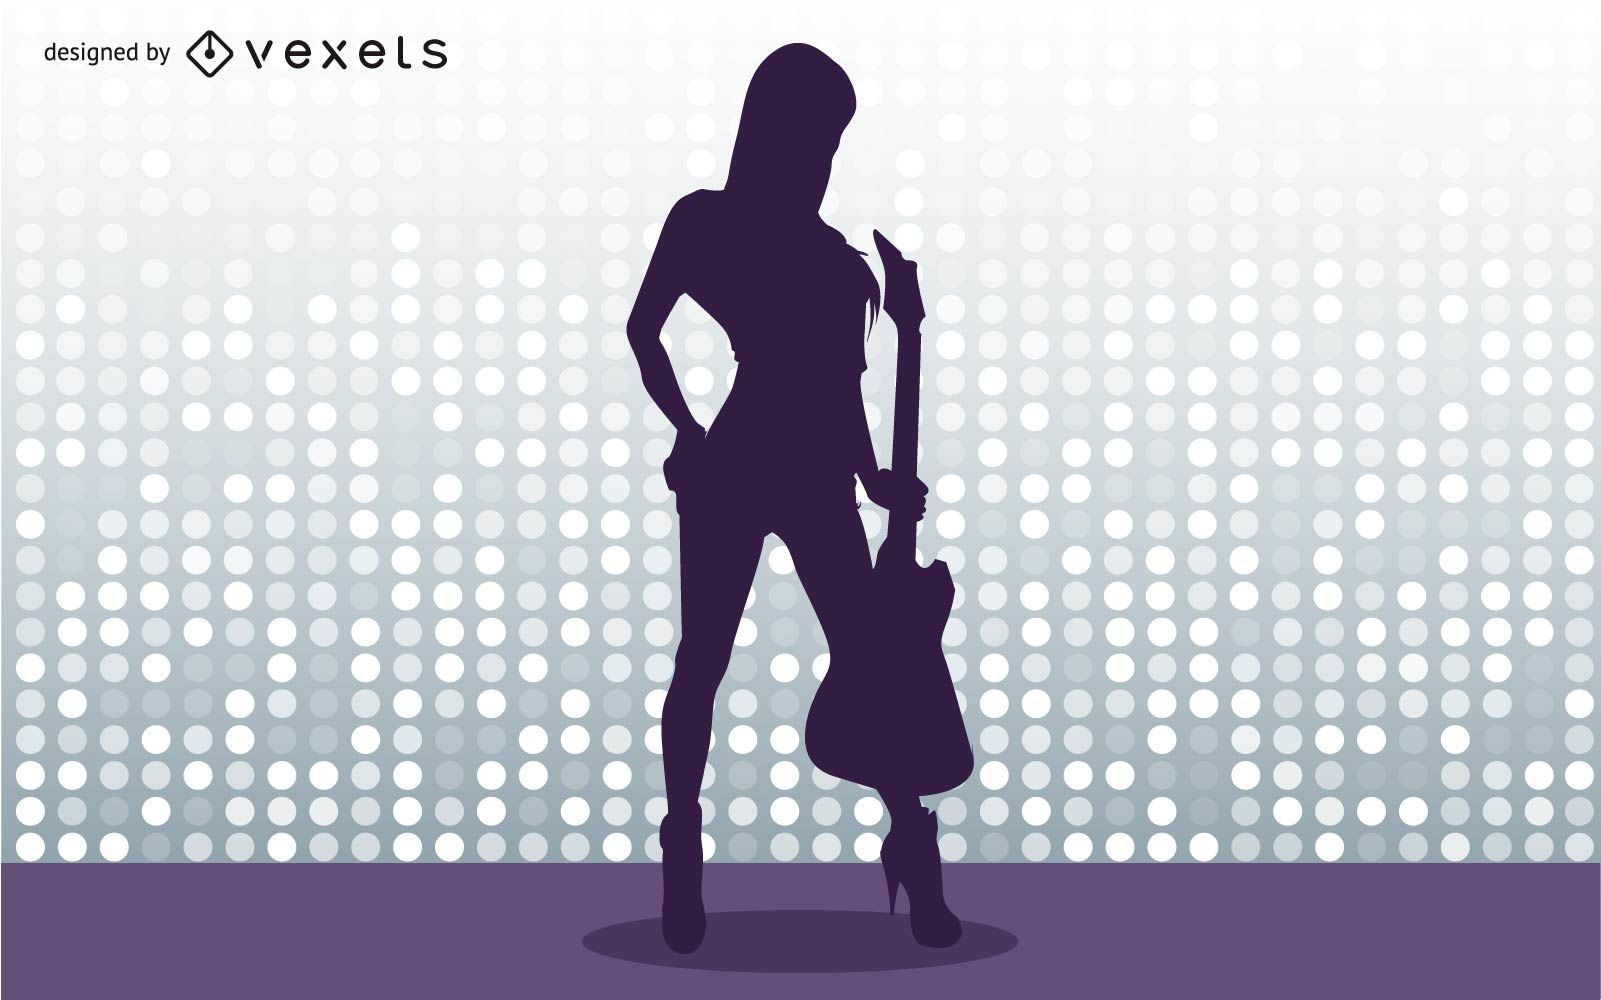 Guitar Player Girl Vector